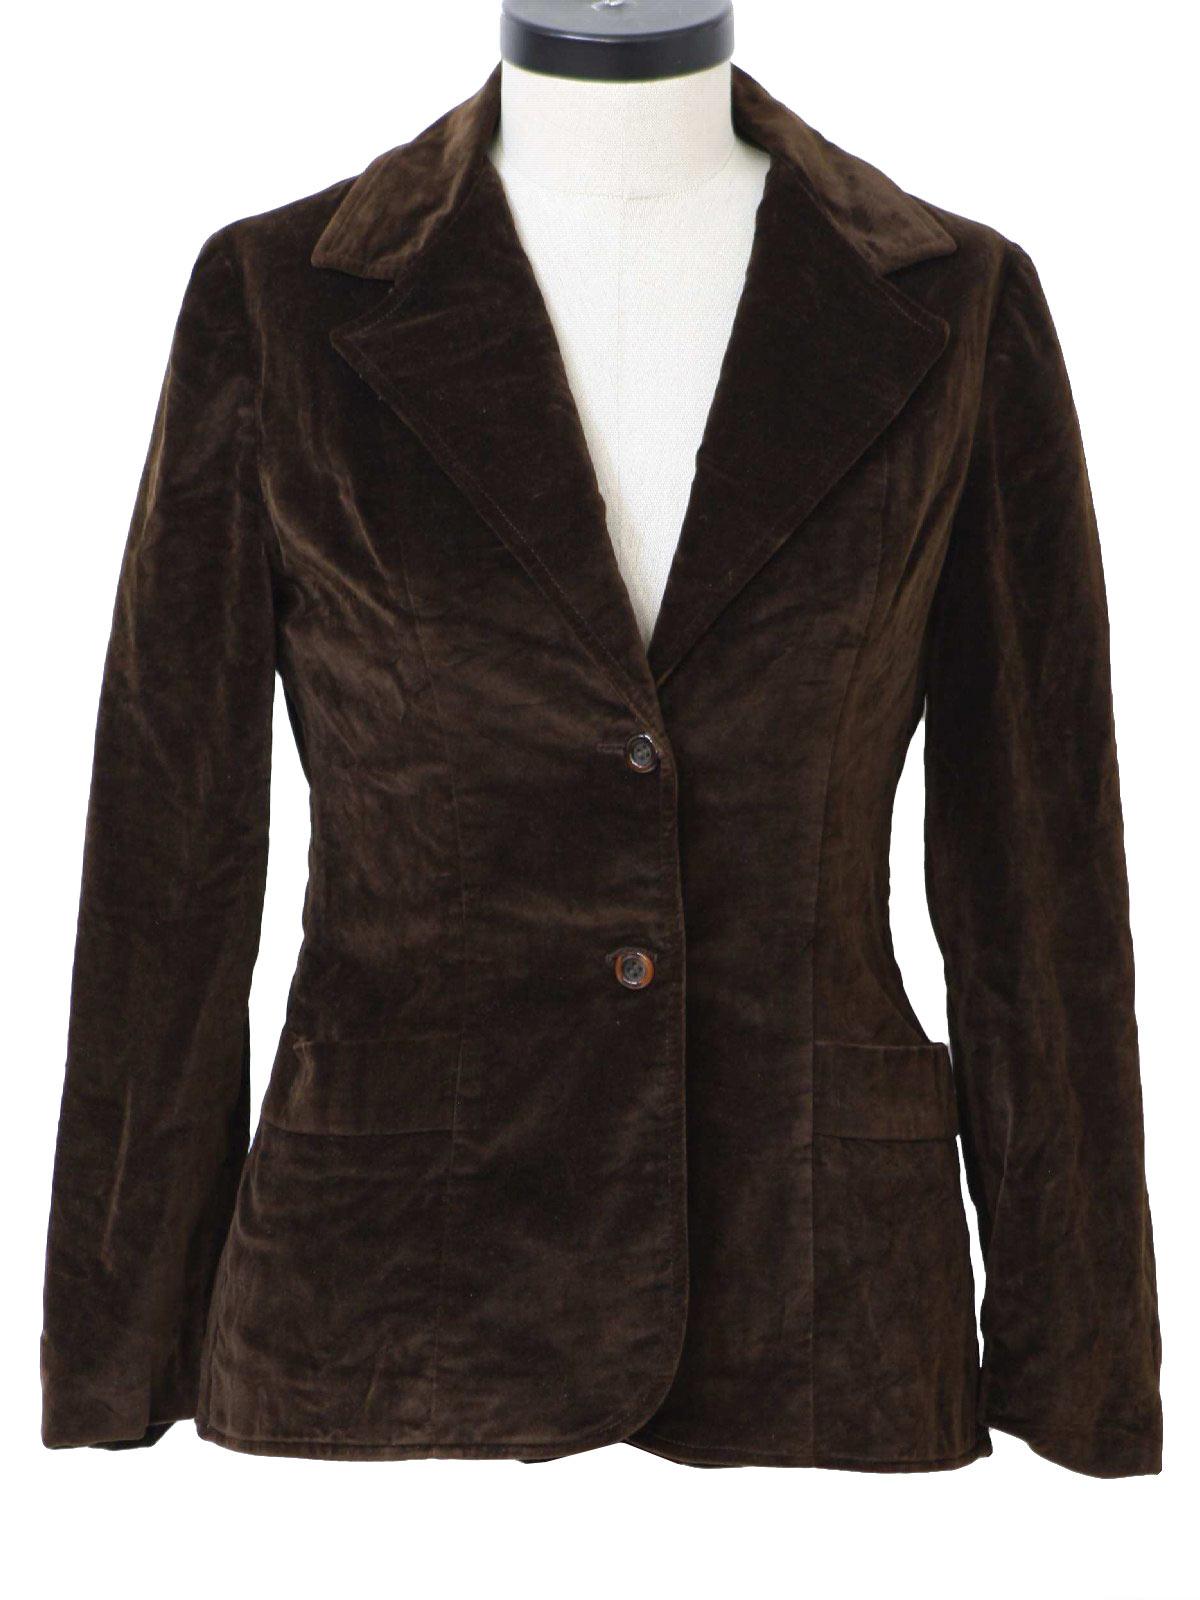 Retro 70's Jacket: 70s -MJ- Womens brown velvet two button blazer ...